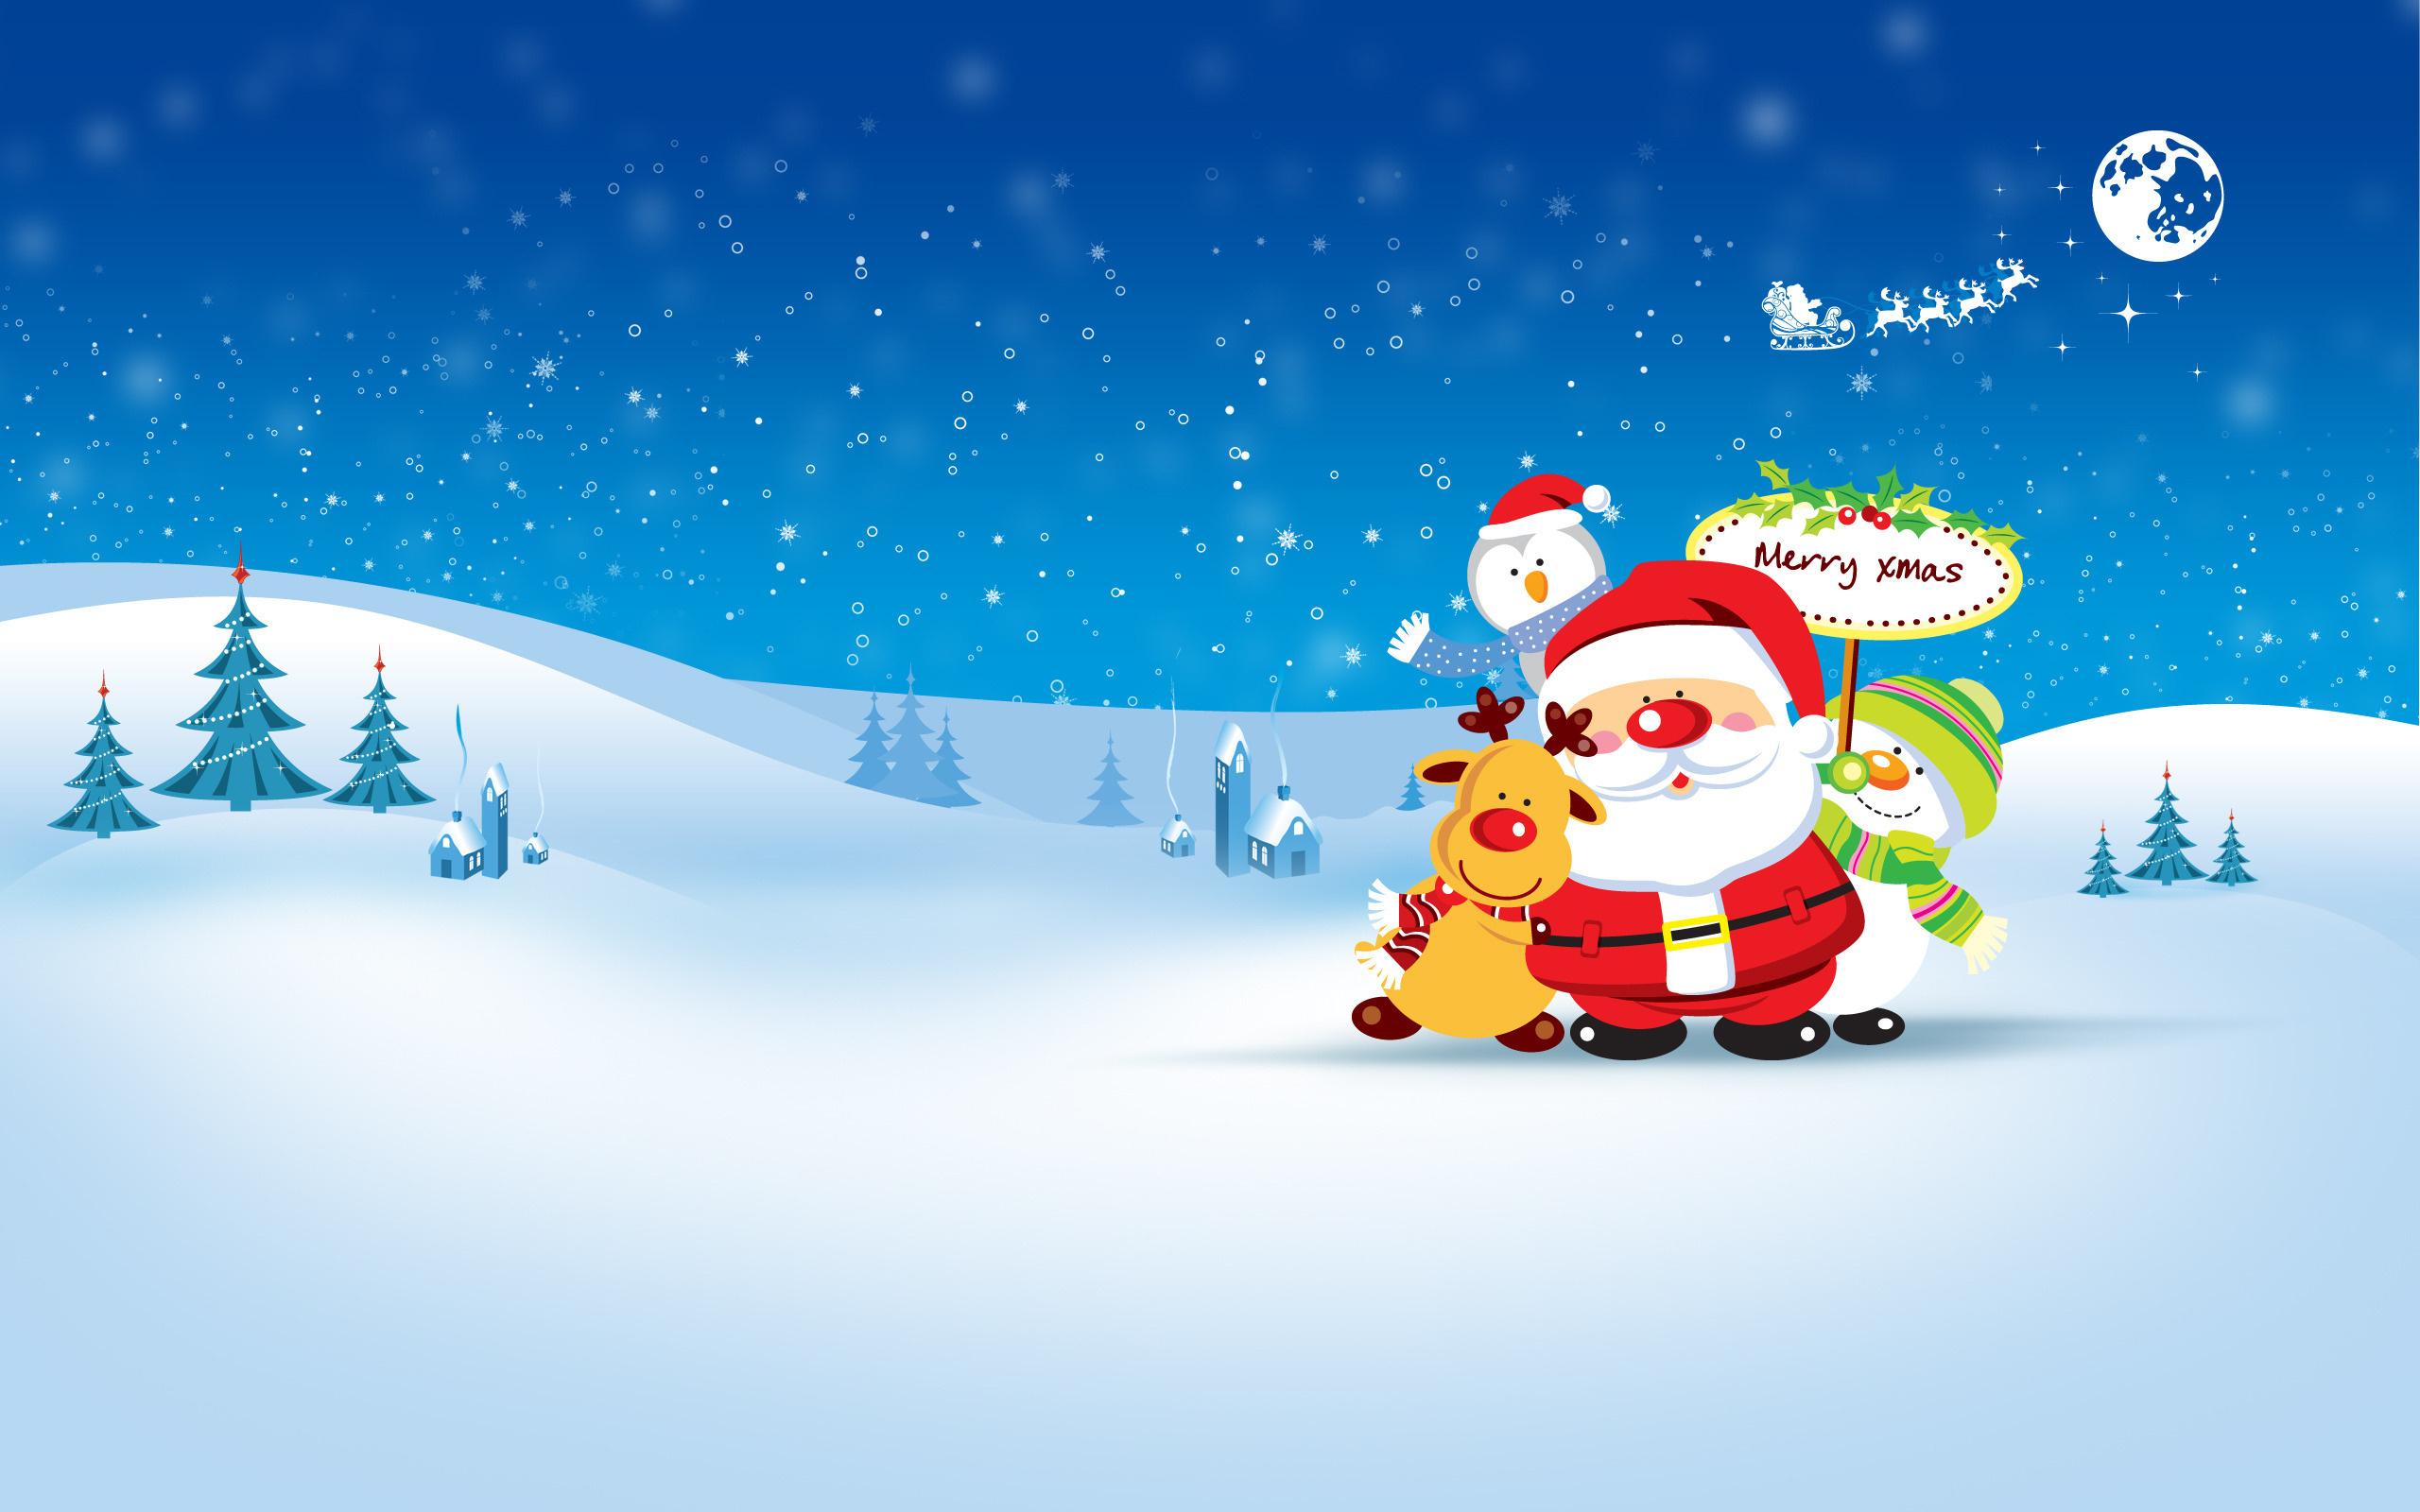 Santa Claus Wallpapers High